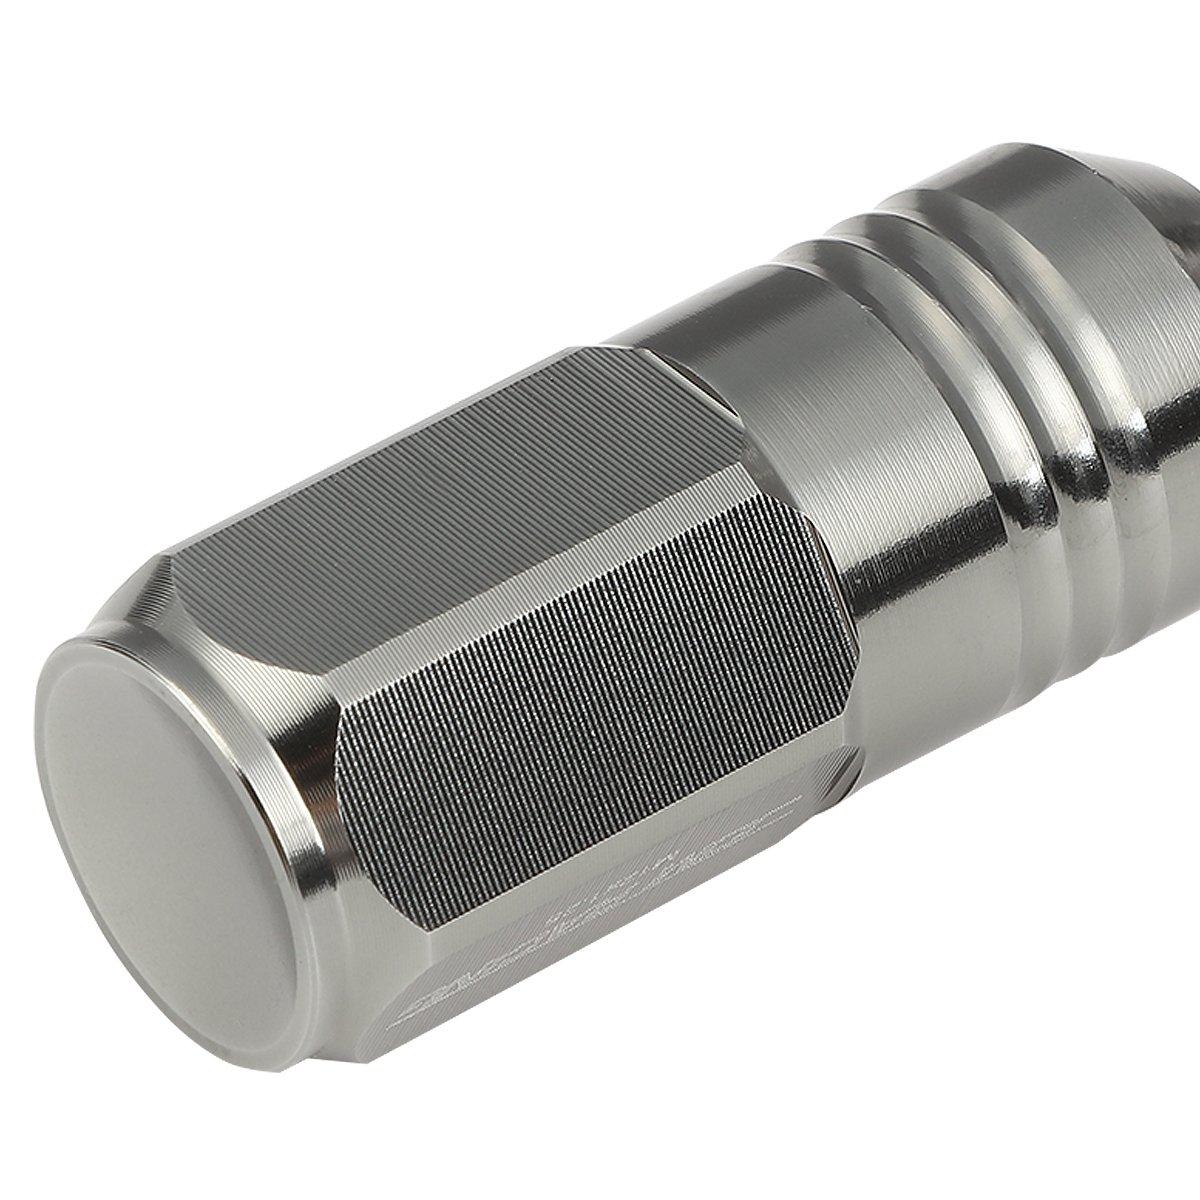 Deep Drive Extension Closed End Design 20-Piece M12 x 1.25 Aluminum Alloy Wheel Lug Nuts Wheel Lug Nuts Gun Metal